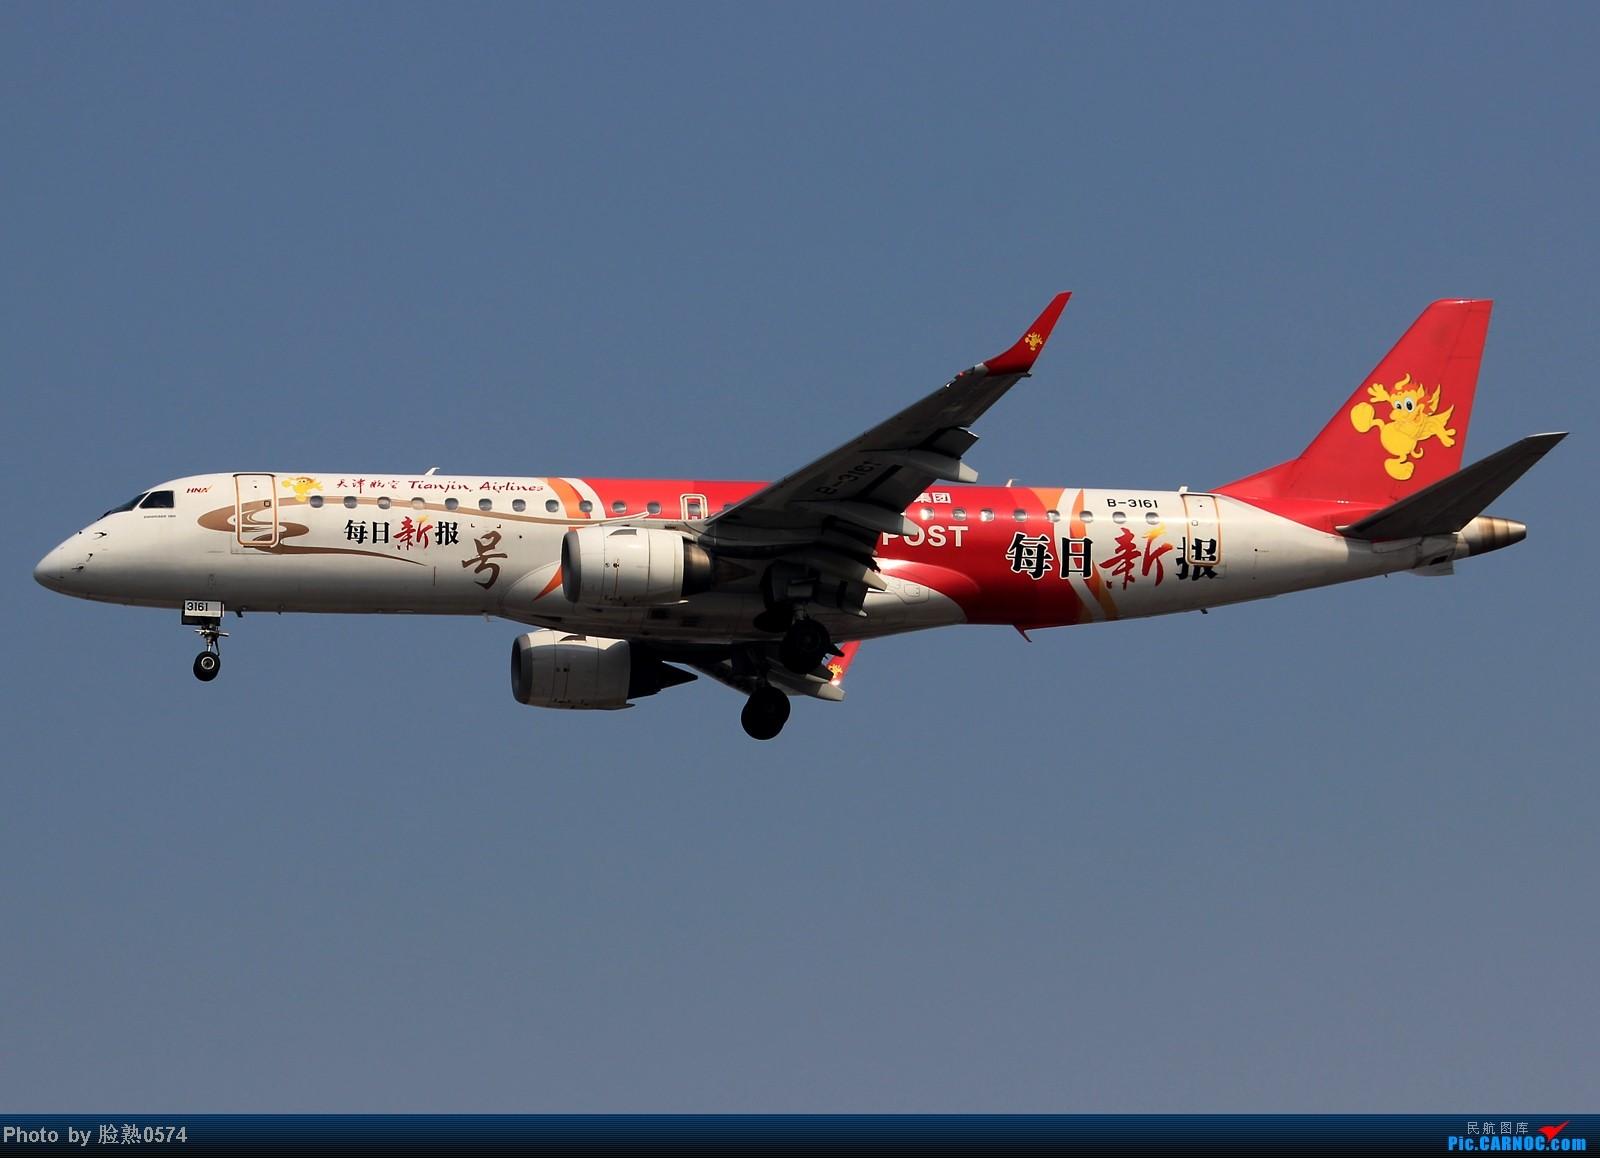 Re:[原创]无聊的等待换来了一架湾流公务机G550 EMBRAER ERJ-190 B-3161 中国宁波栎社机场